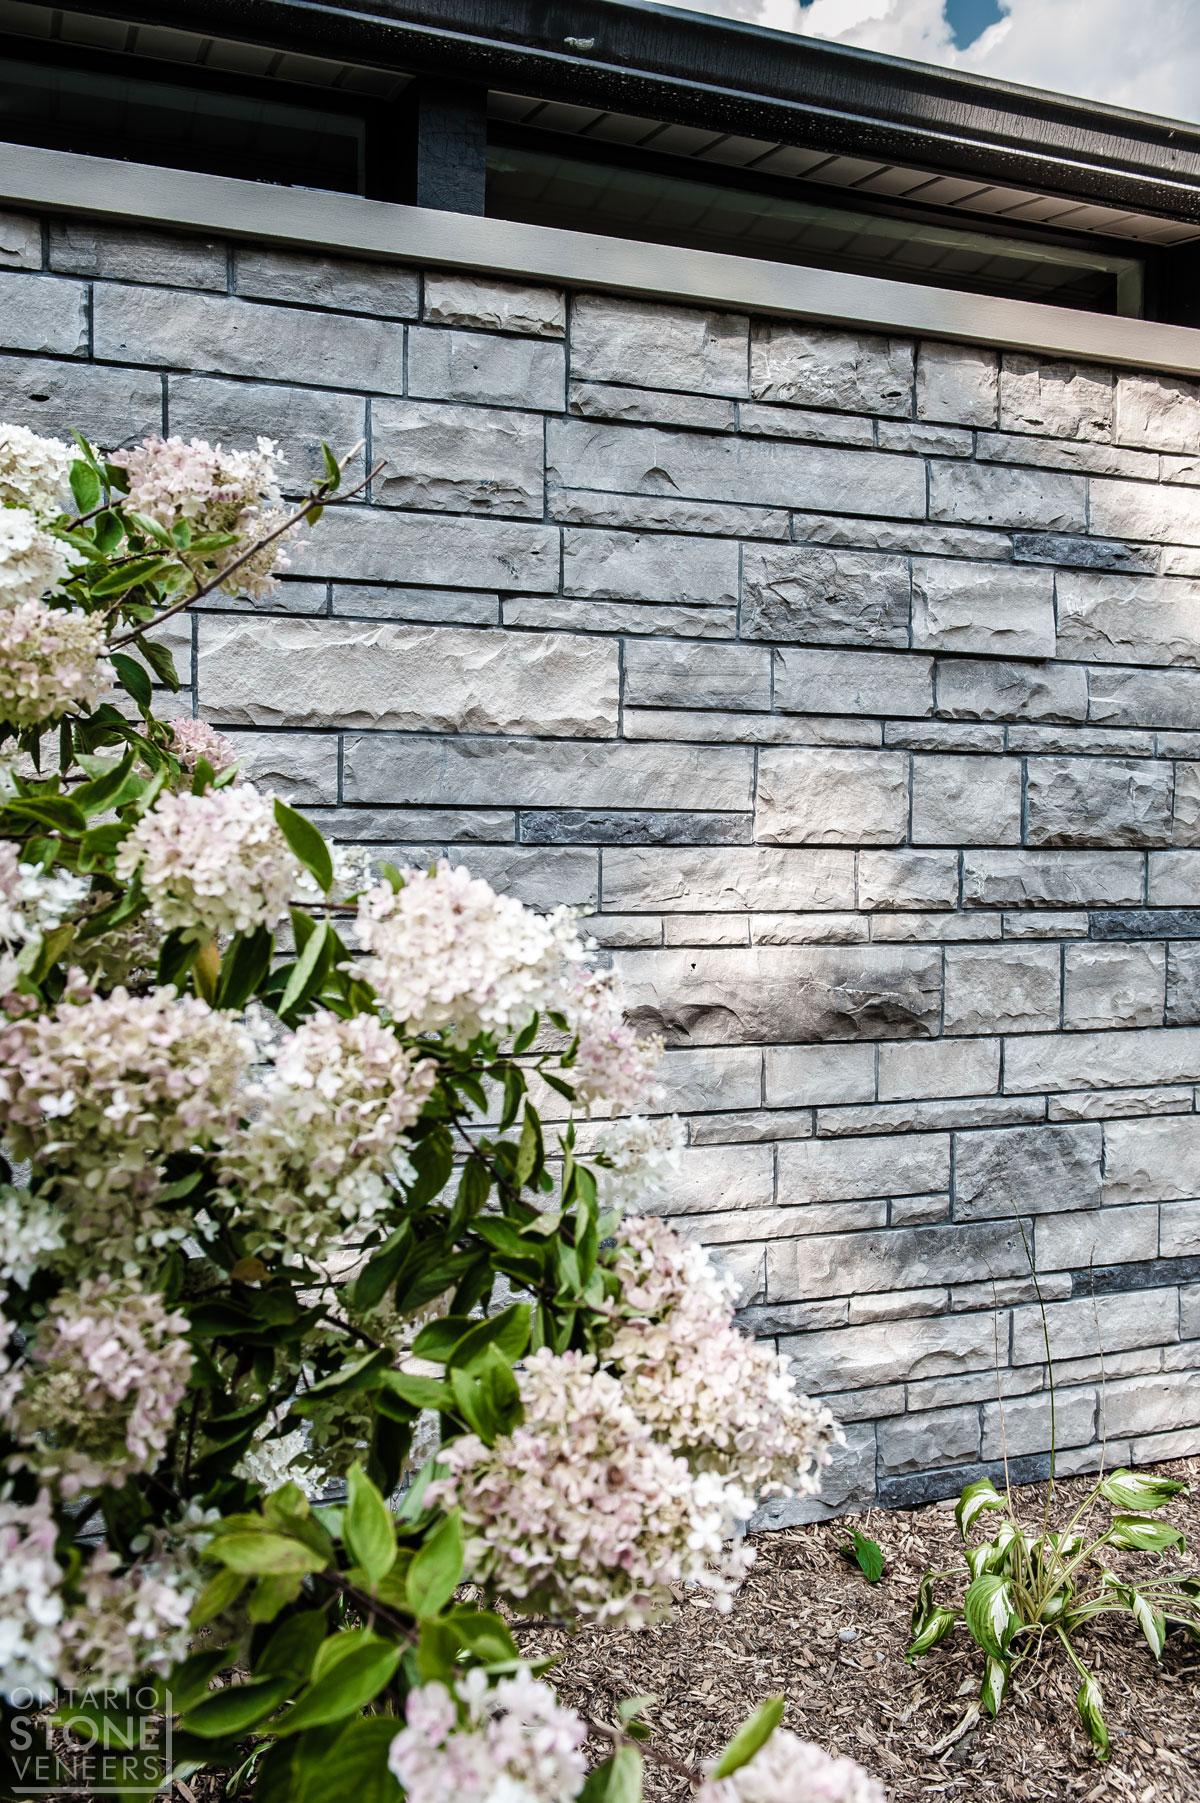 Natural Stone Veneers ǀ Faux Stone Siding ǀ Stone Veneer: High Quality Natural Stone Veneers